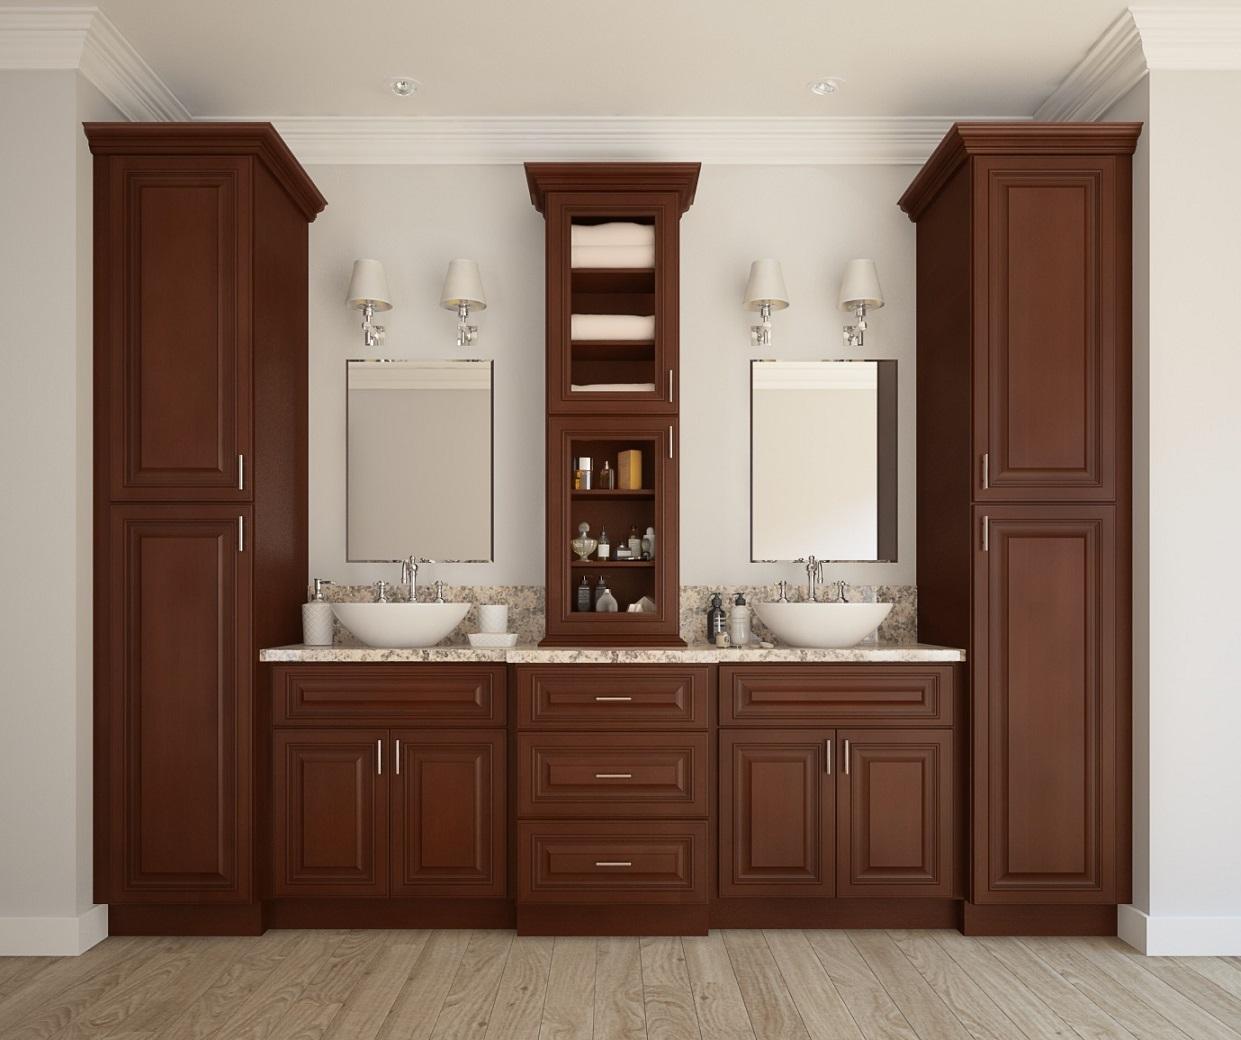 Signature Chocolate Pre-Assembled Bathroom Vanities